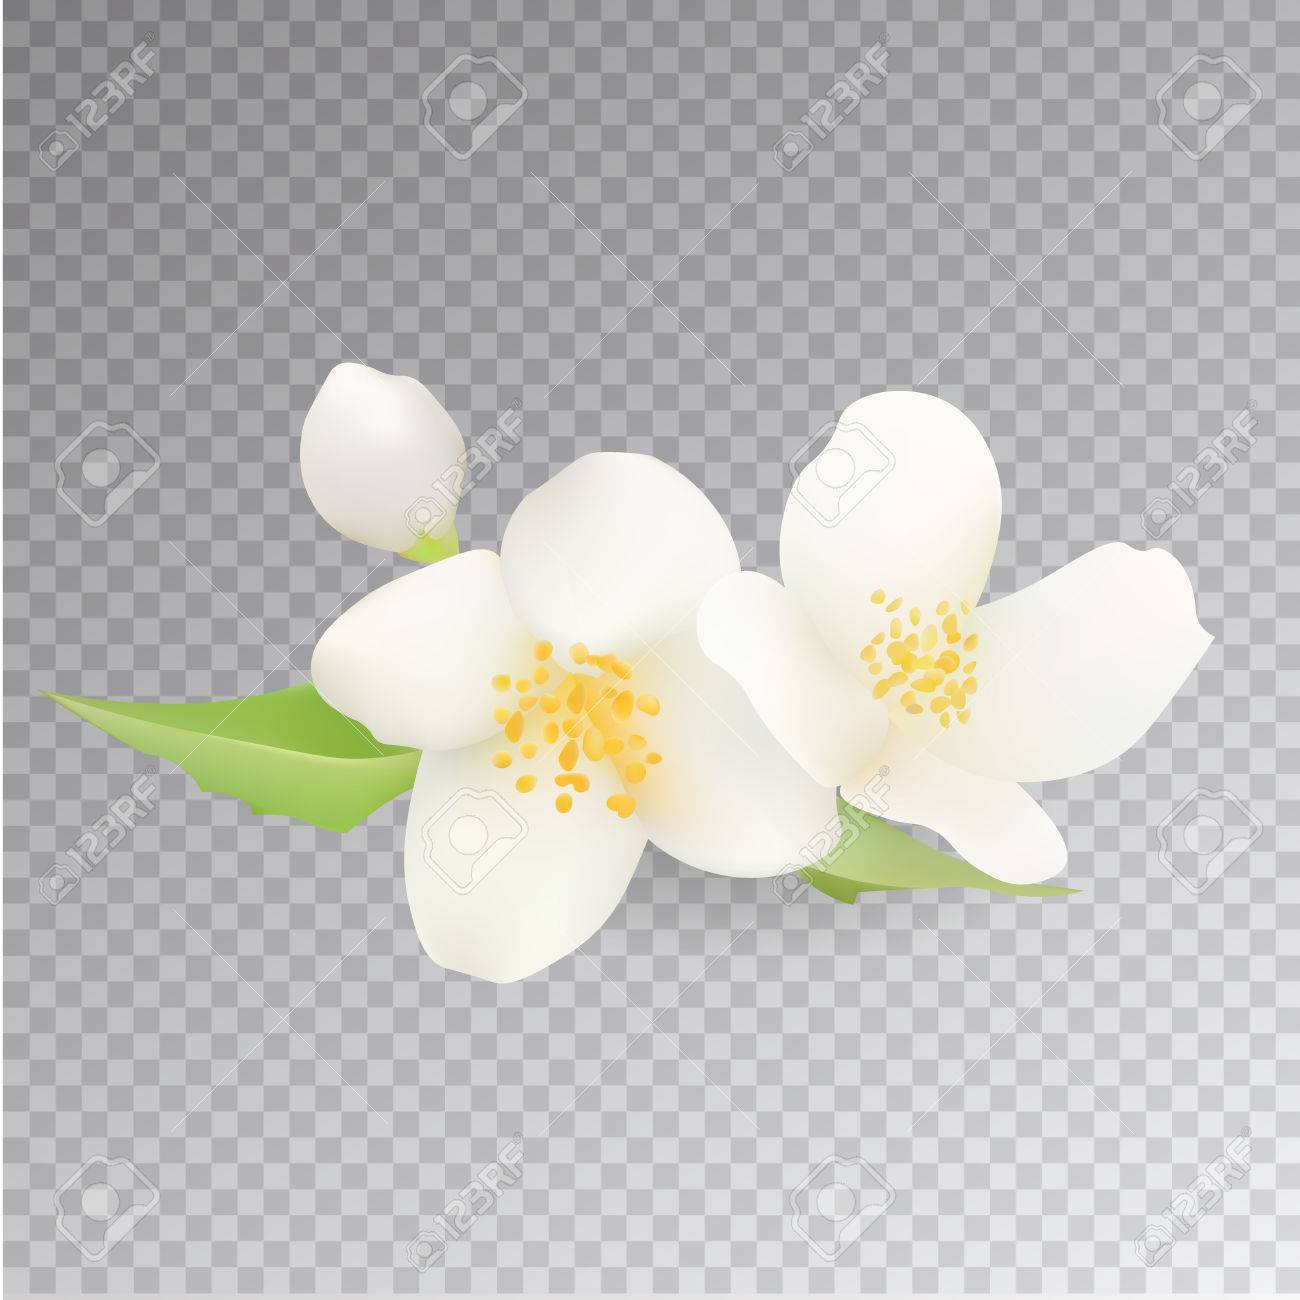 Realistic Jasmine Flower Icon Isolated On Transparent Background